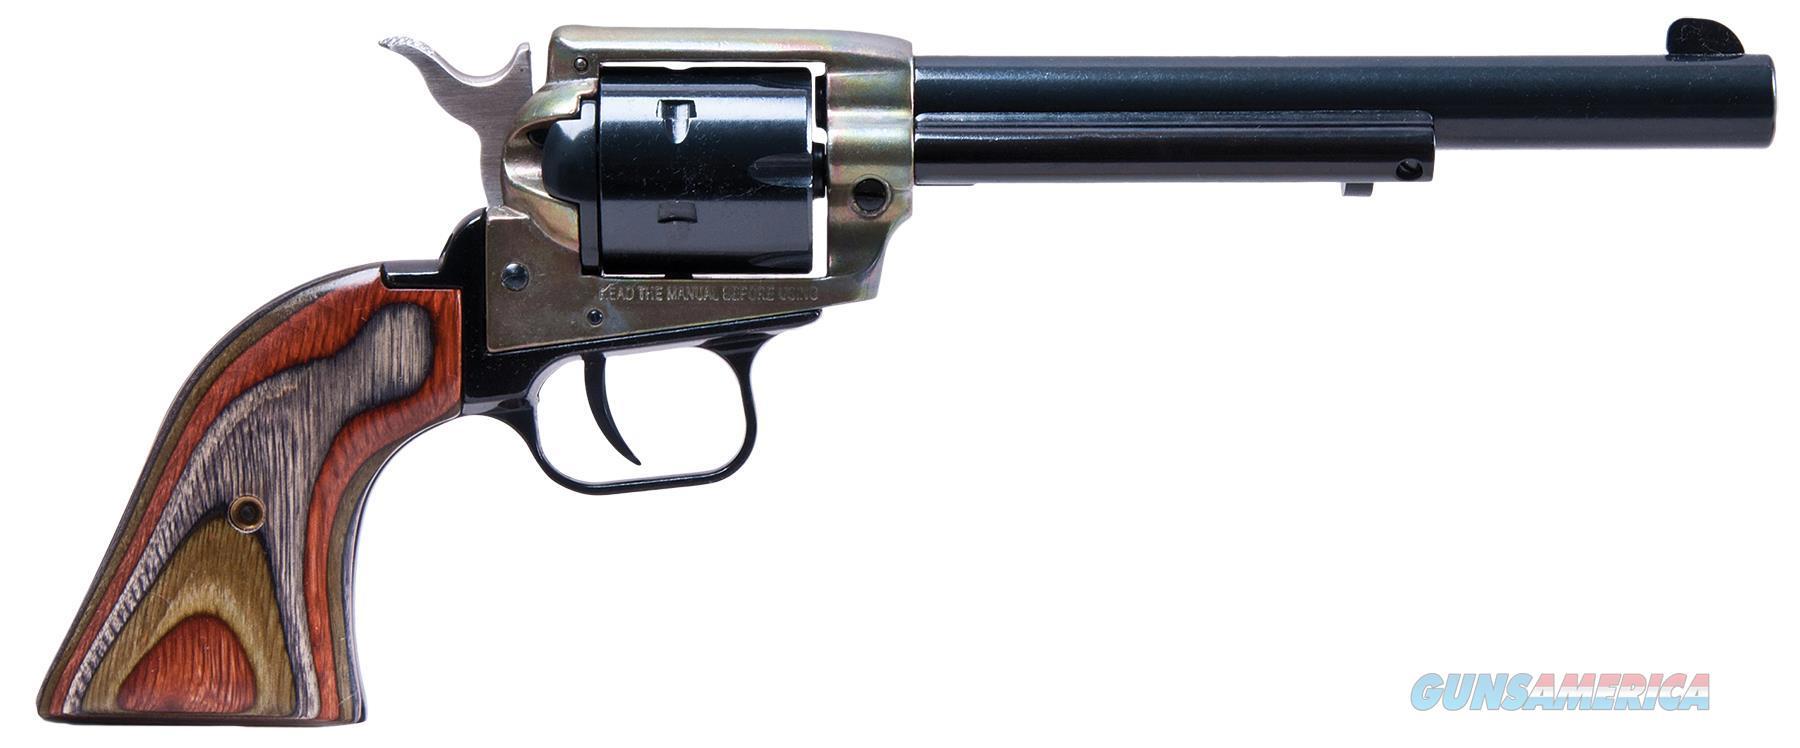 "Heritage Mfg Rr22mch4 Rough Rider Small Bore Single 22 Long Rifle 4.75"" 6 Camo Laminate Black RR22MCH4  Guns > Pistols > Heritage"